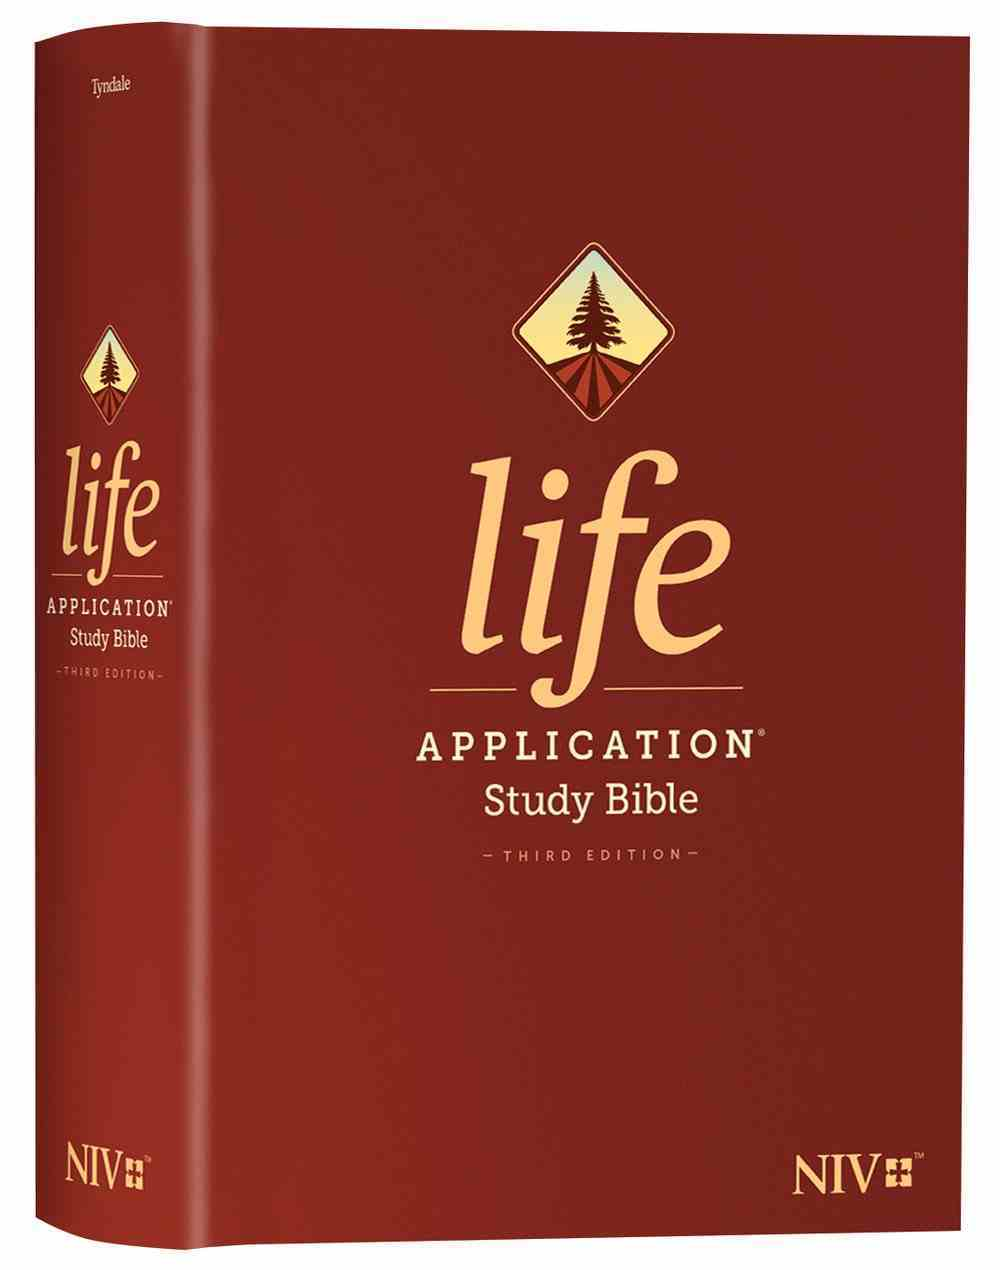 NIV Life Application Study Bible 3rd Edition (Black Letter Edition) Hardback